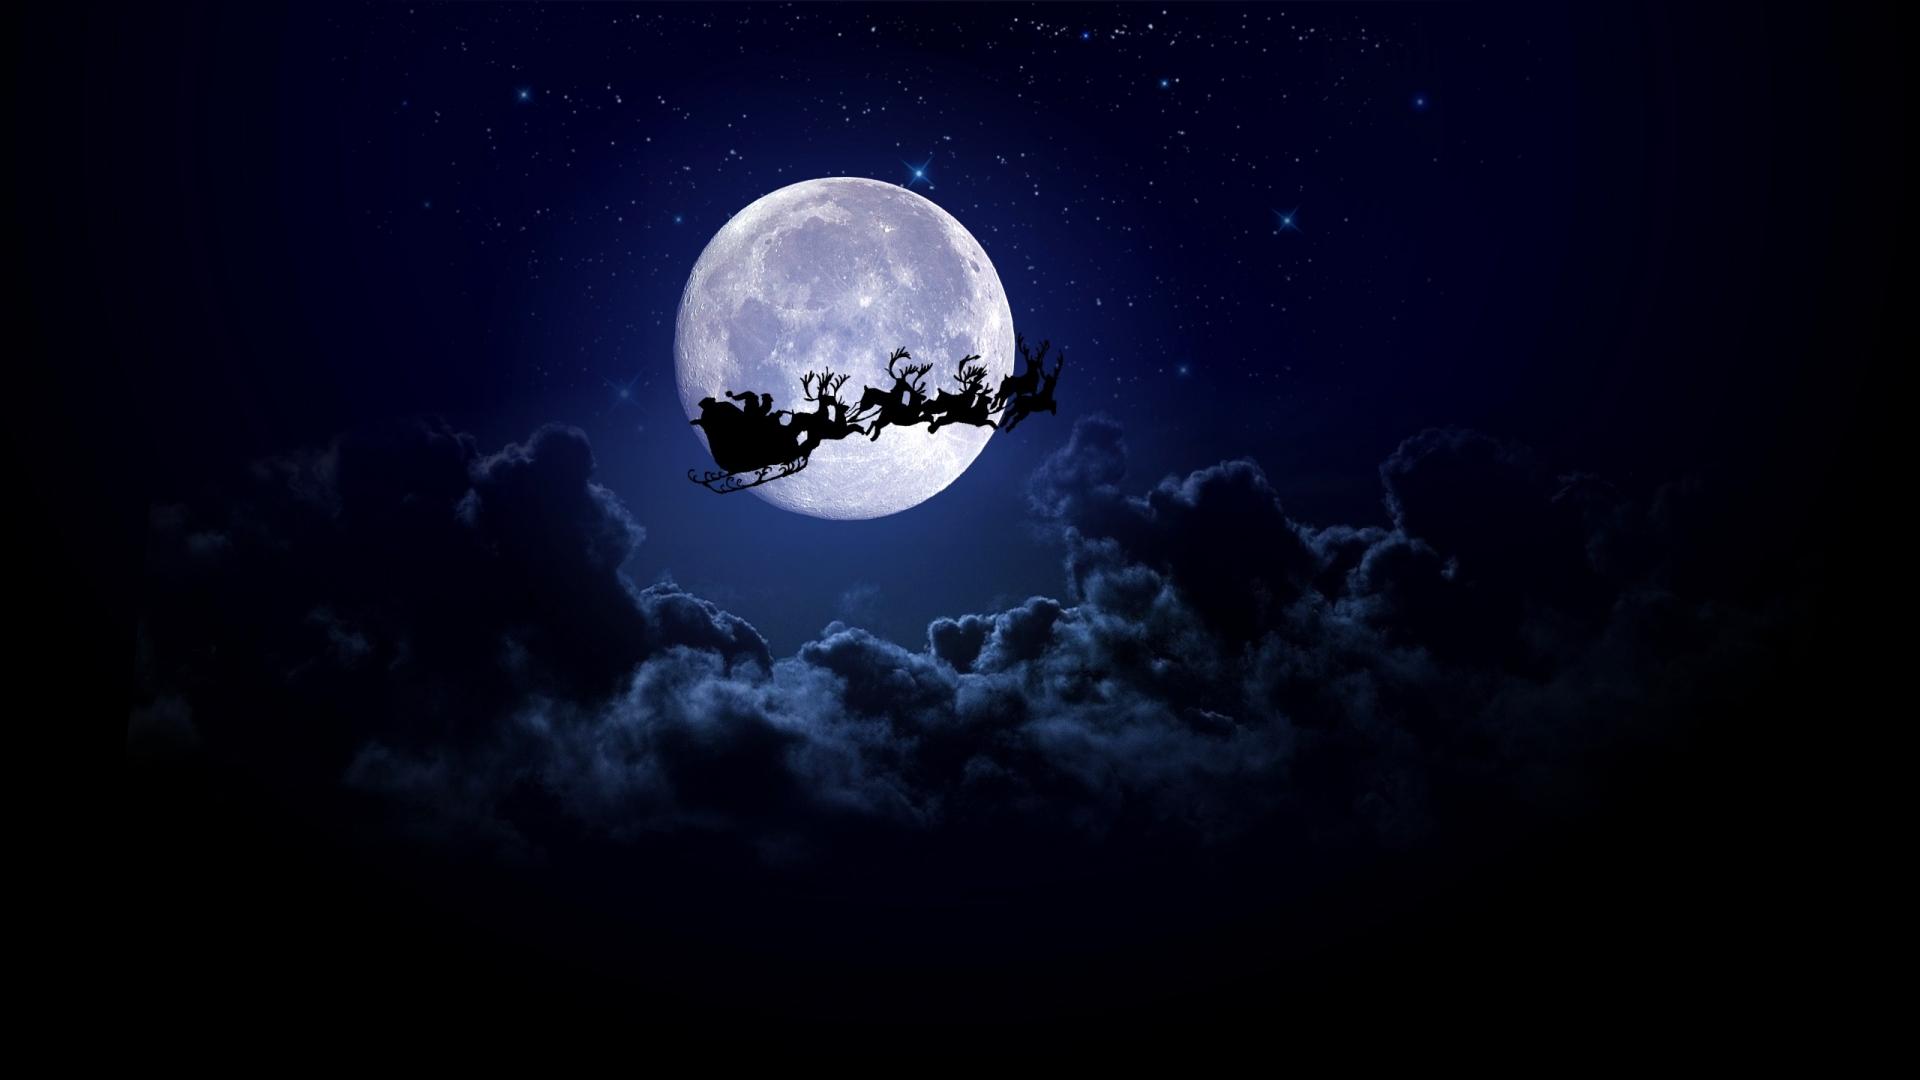 Santa on the Moon Wallpaper